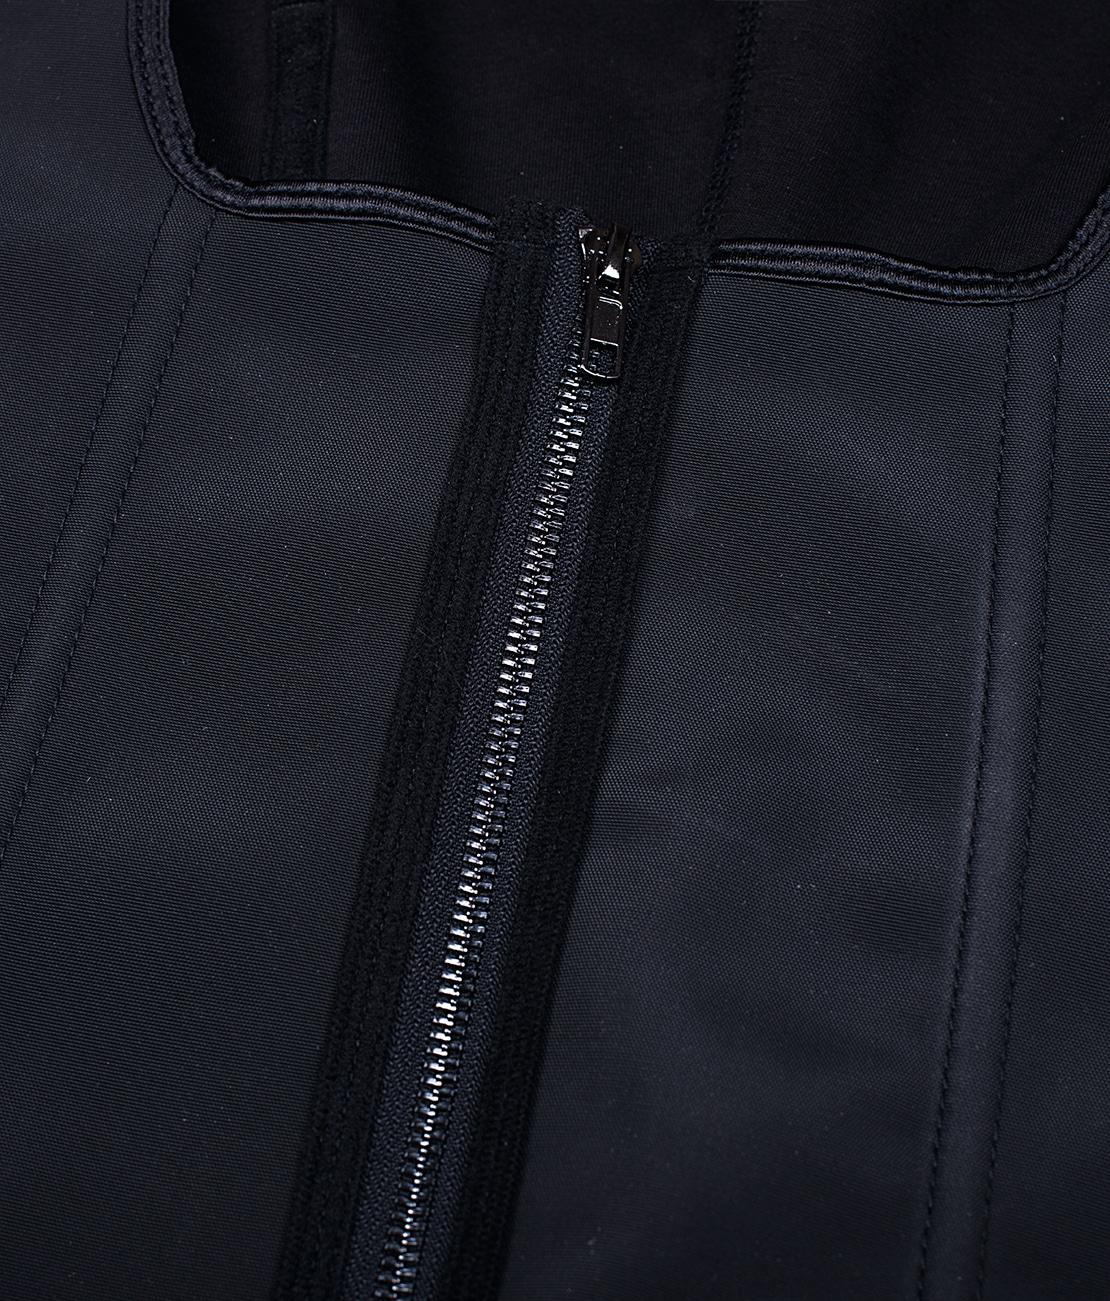 Corset Latex Remodelant Noir Packshot Detail 3